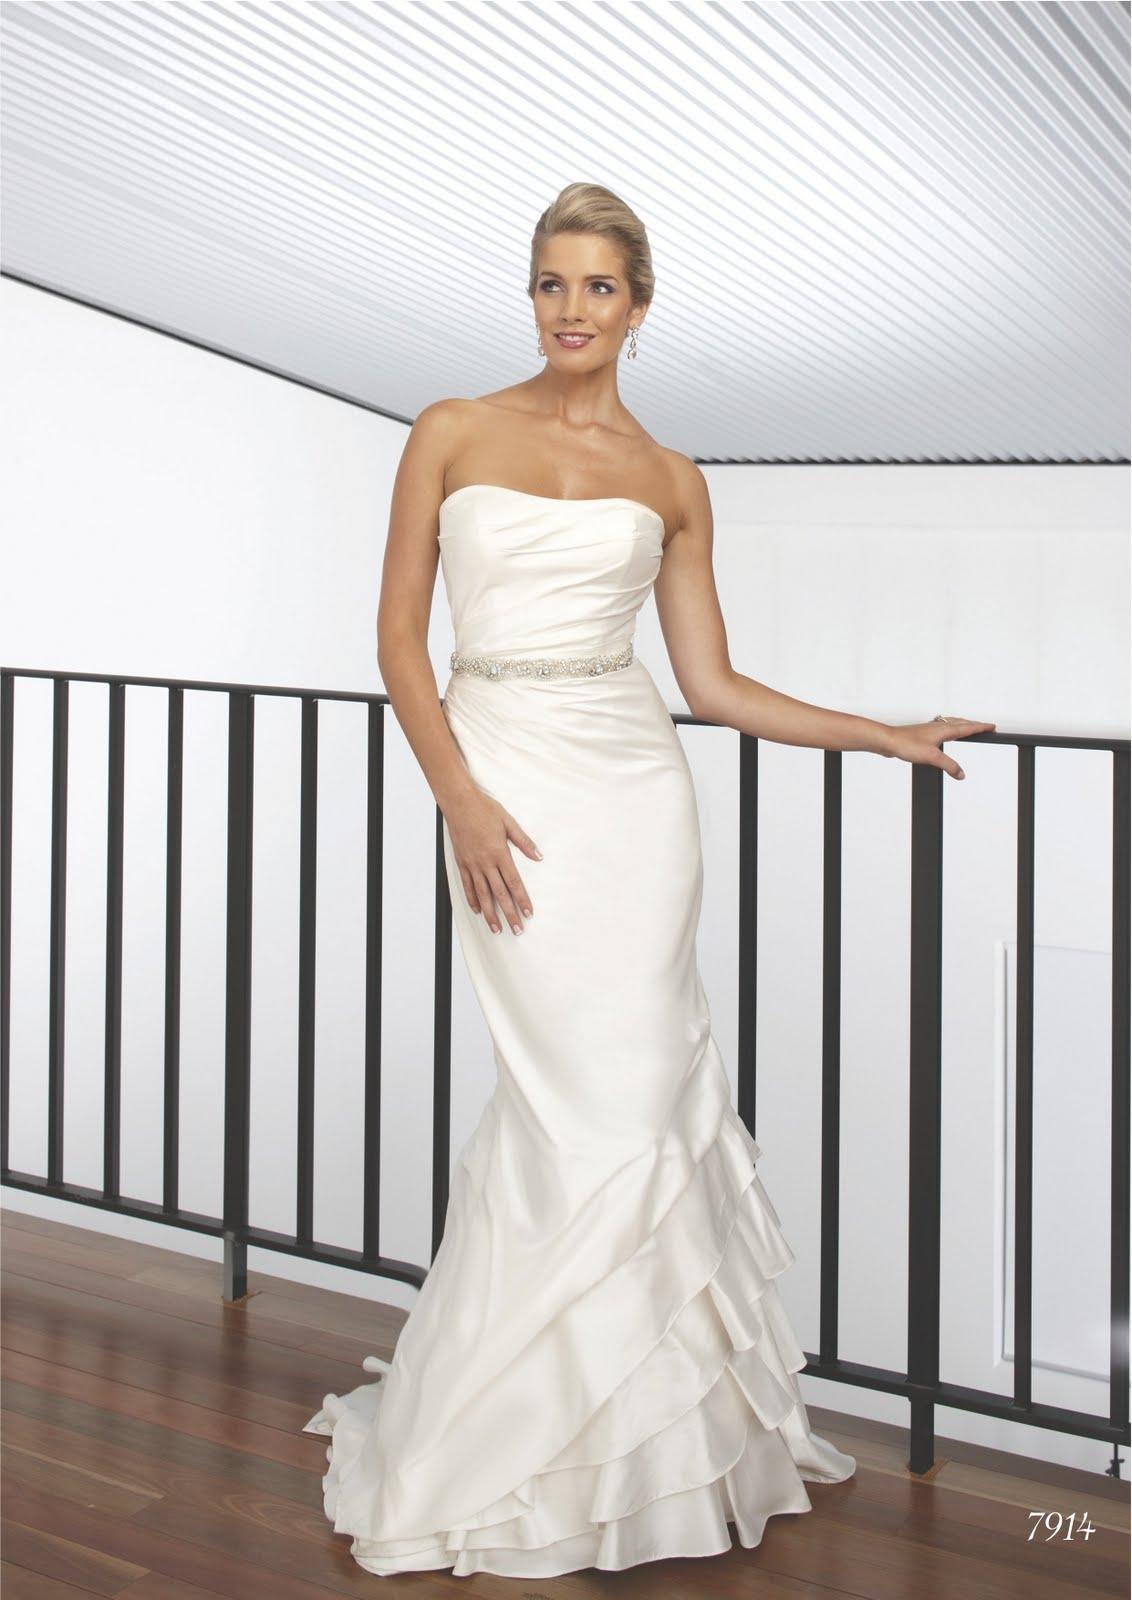 wedding dress sydney - photo#35